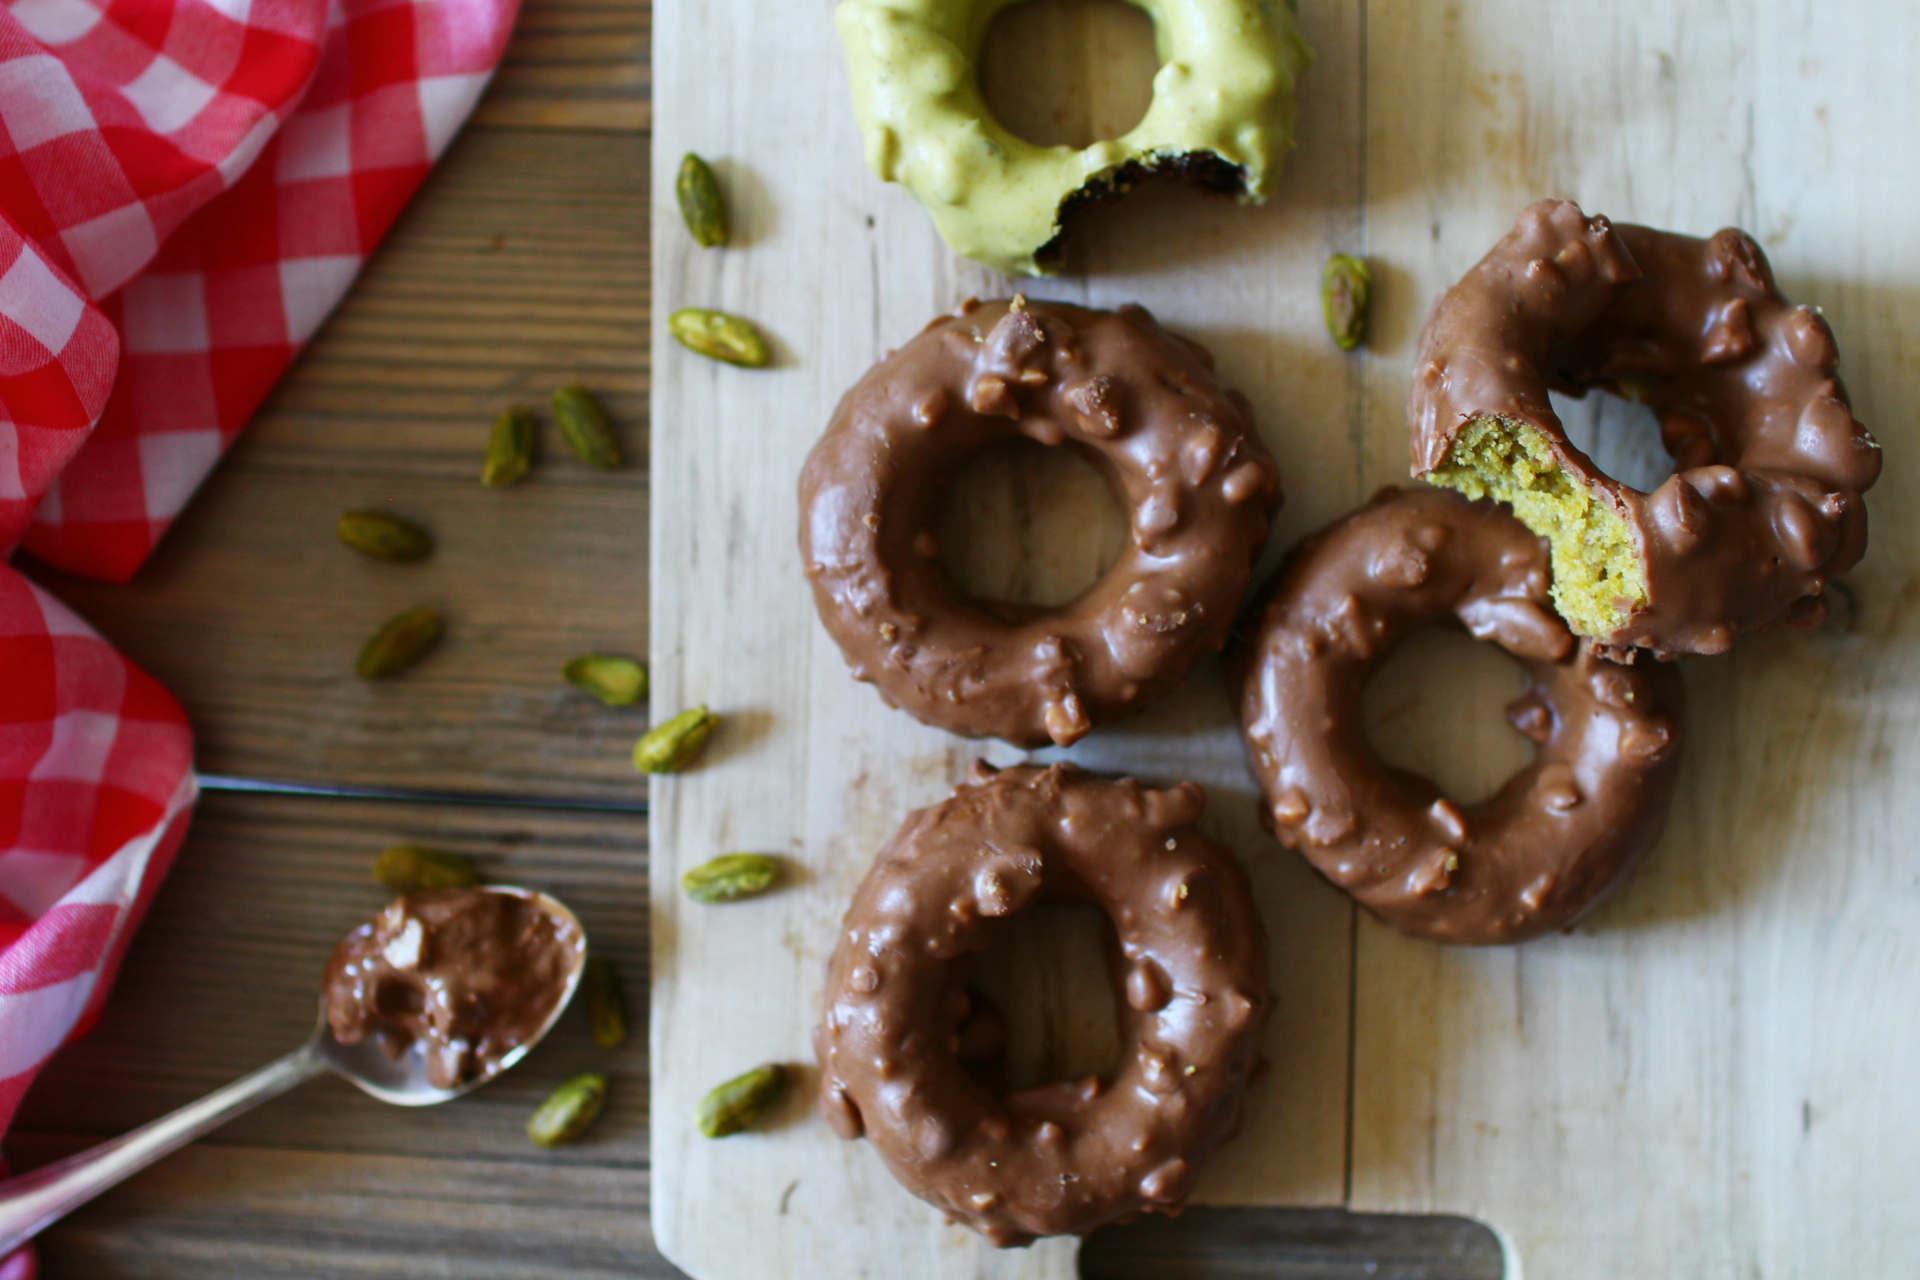 gateau donut chocolat pistache